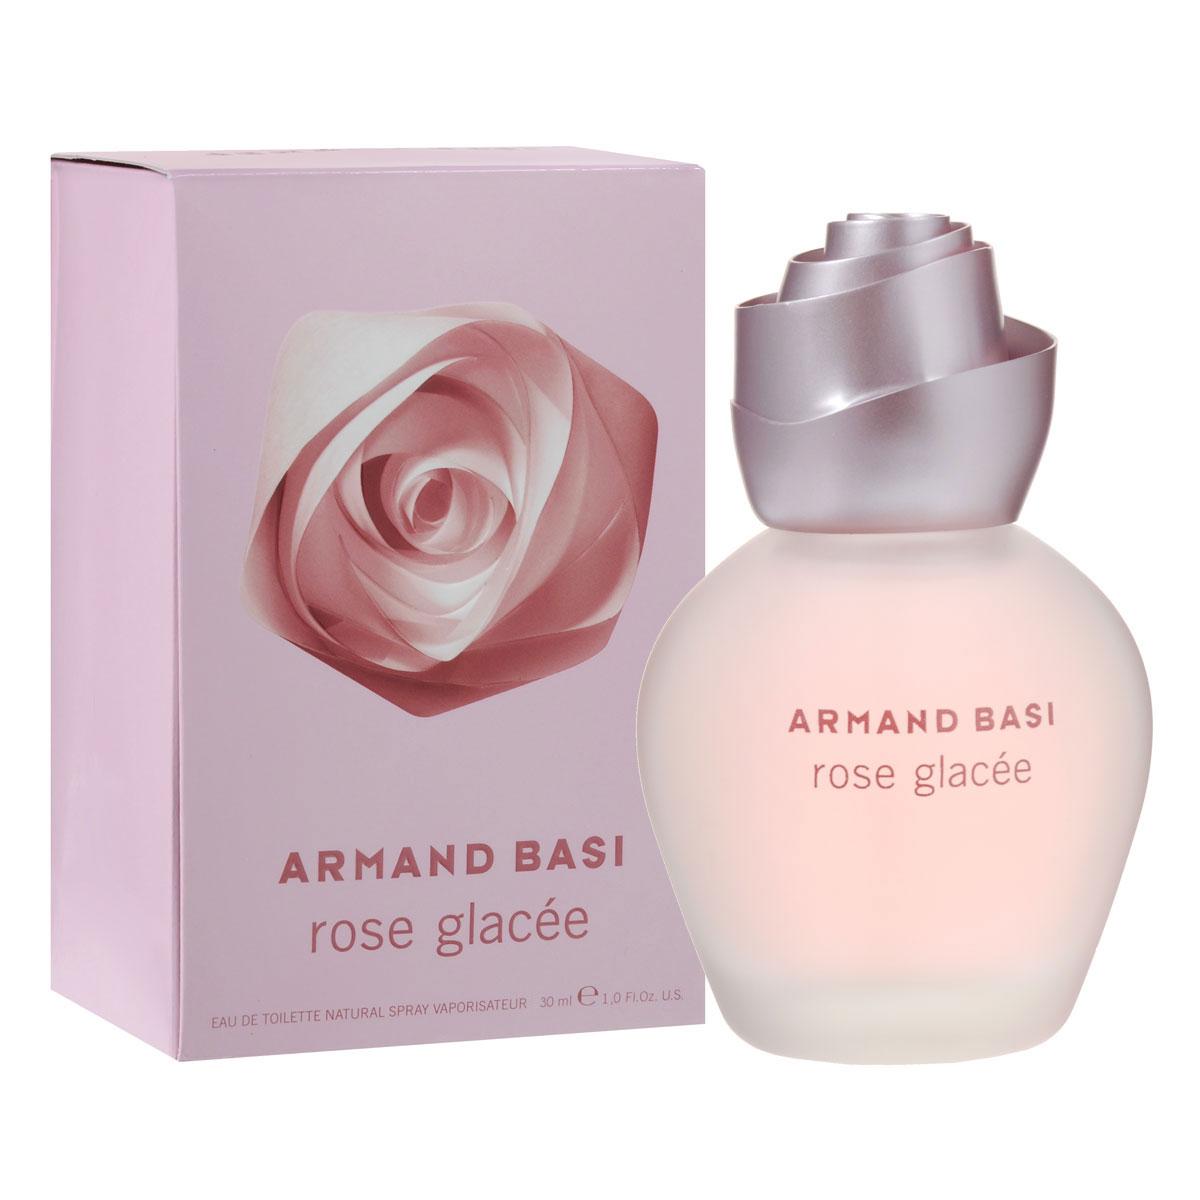 Armand Basi Туалетная вода Rose Glacee, женская, 30 мл armand basi туалетная вода rose glacee 100 ml